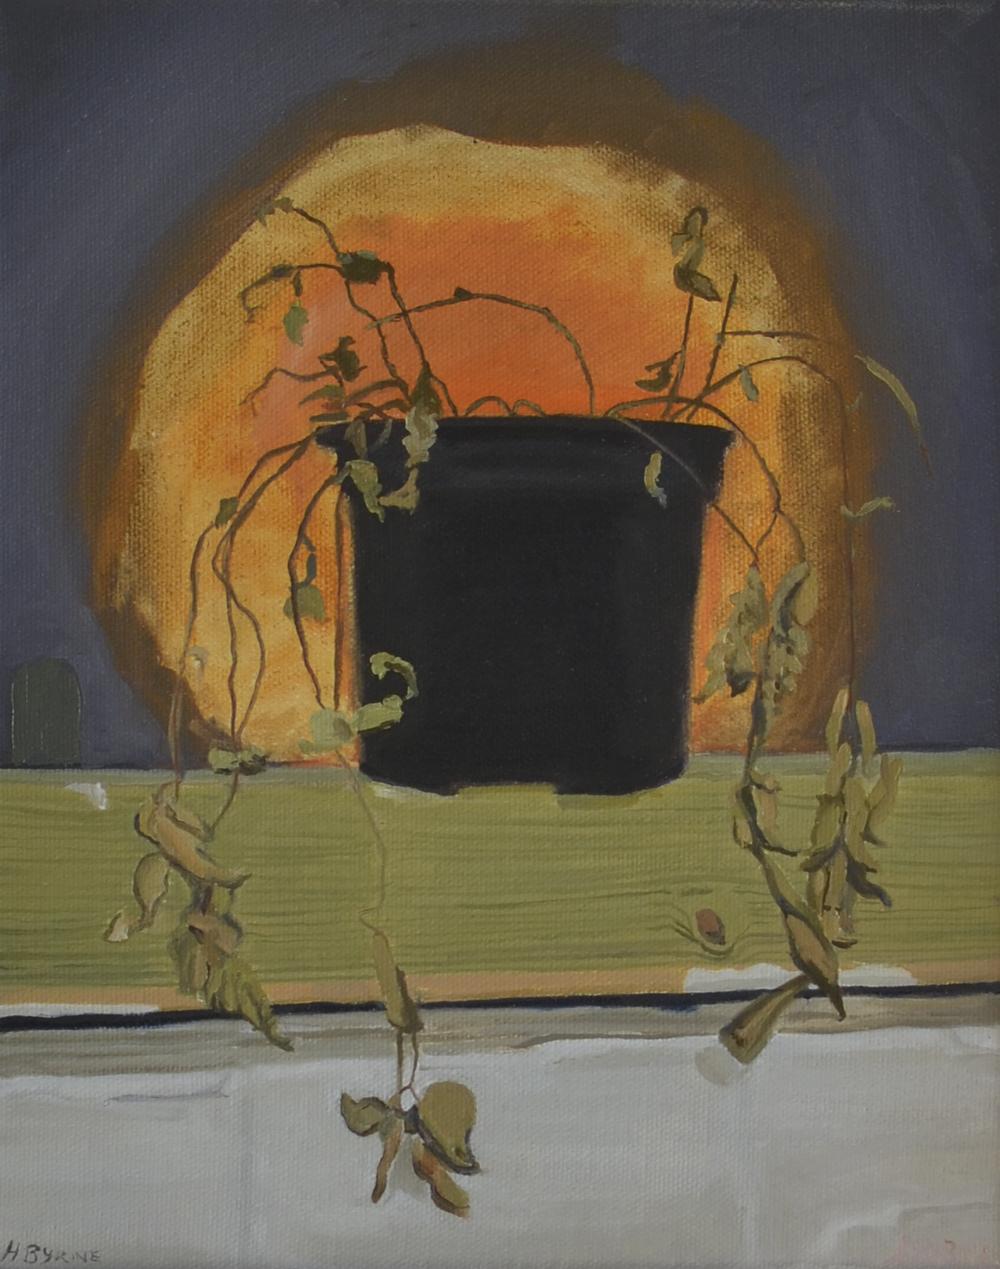 plant at night, night light, henry byrne